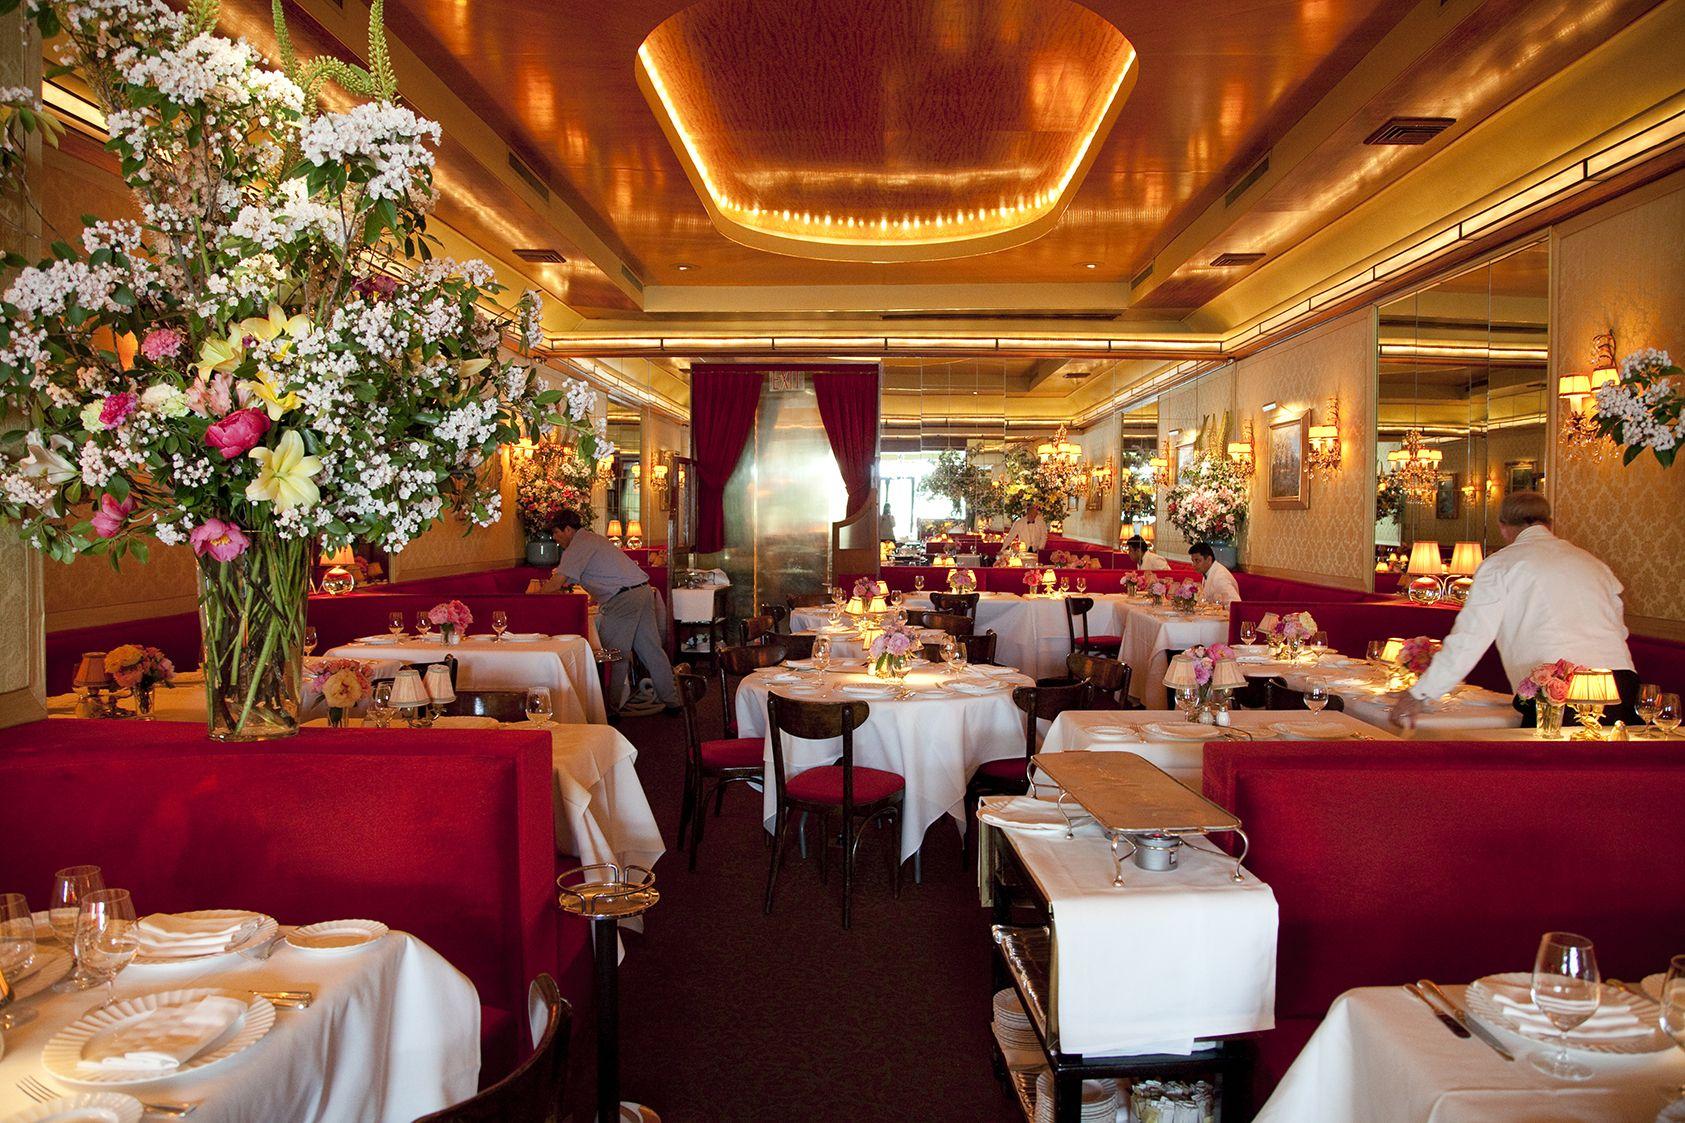 The Most Romantic Restaurants In Nyc Romantic Restaurant Nyc Restaurants Nyc Guide